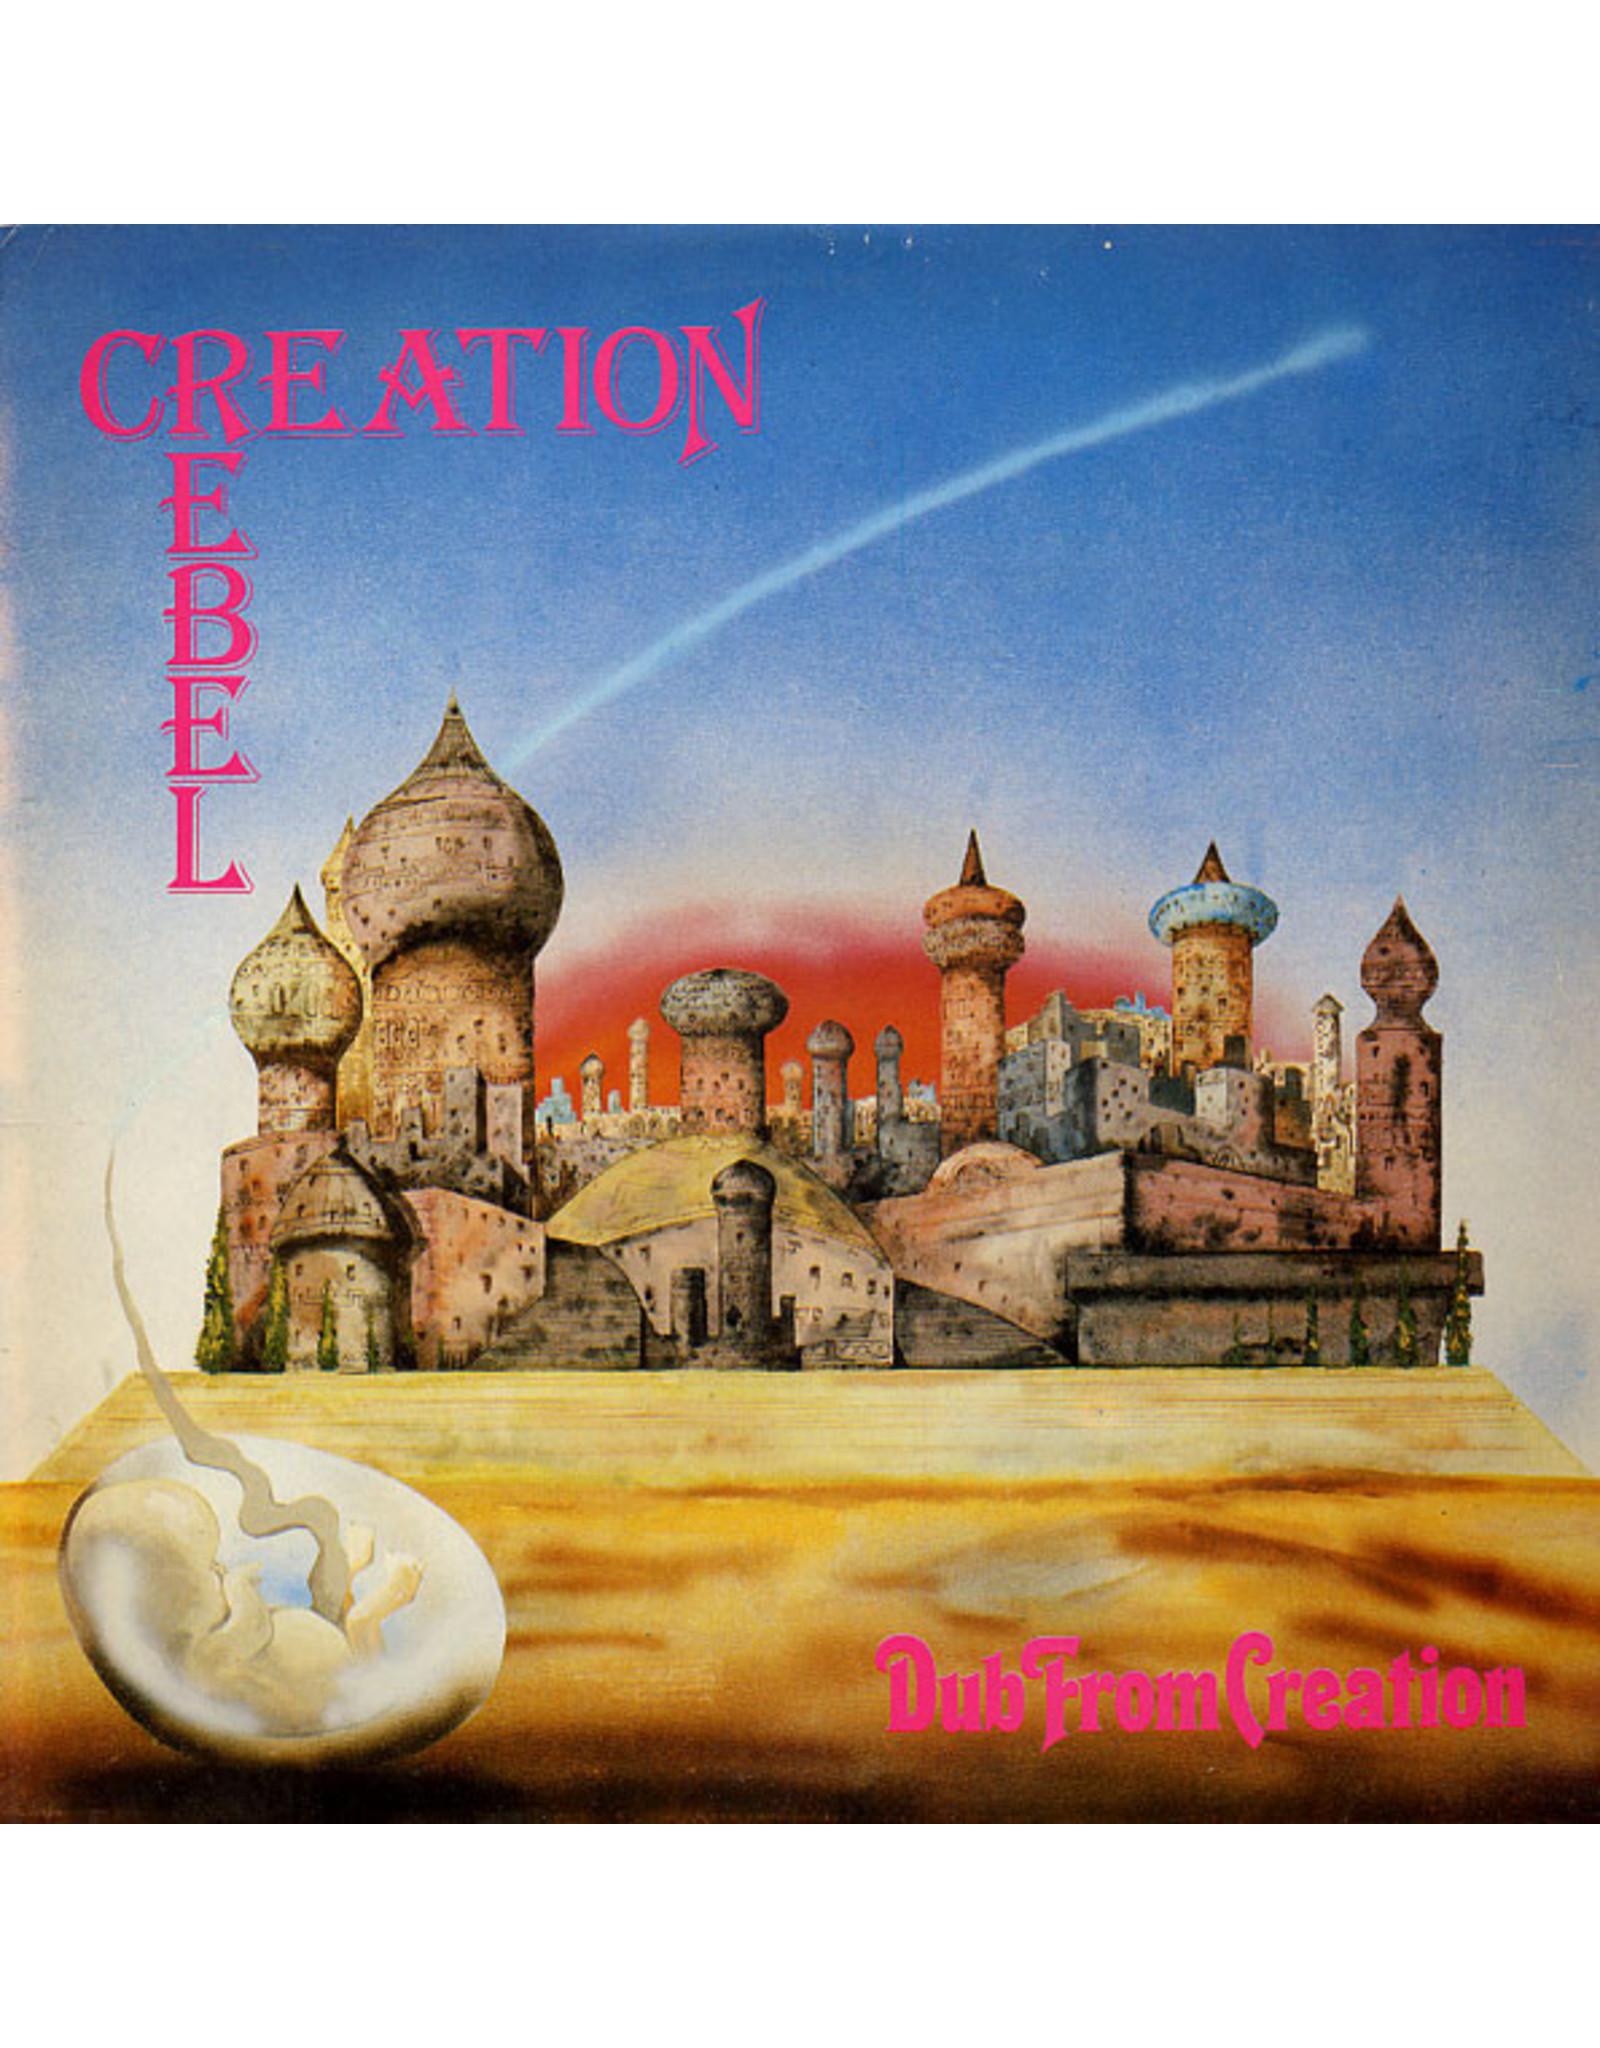 New Vinyl Creation Rebel - Dub From Creation LP